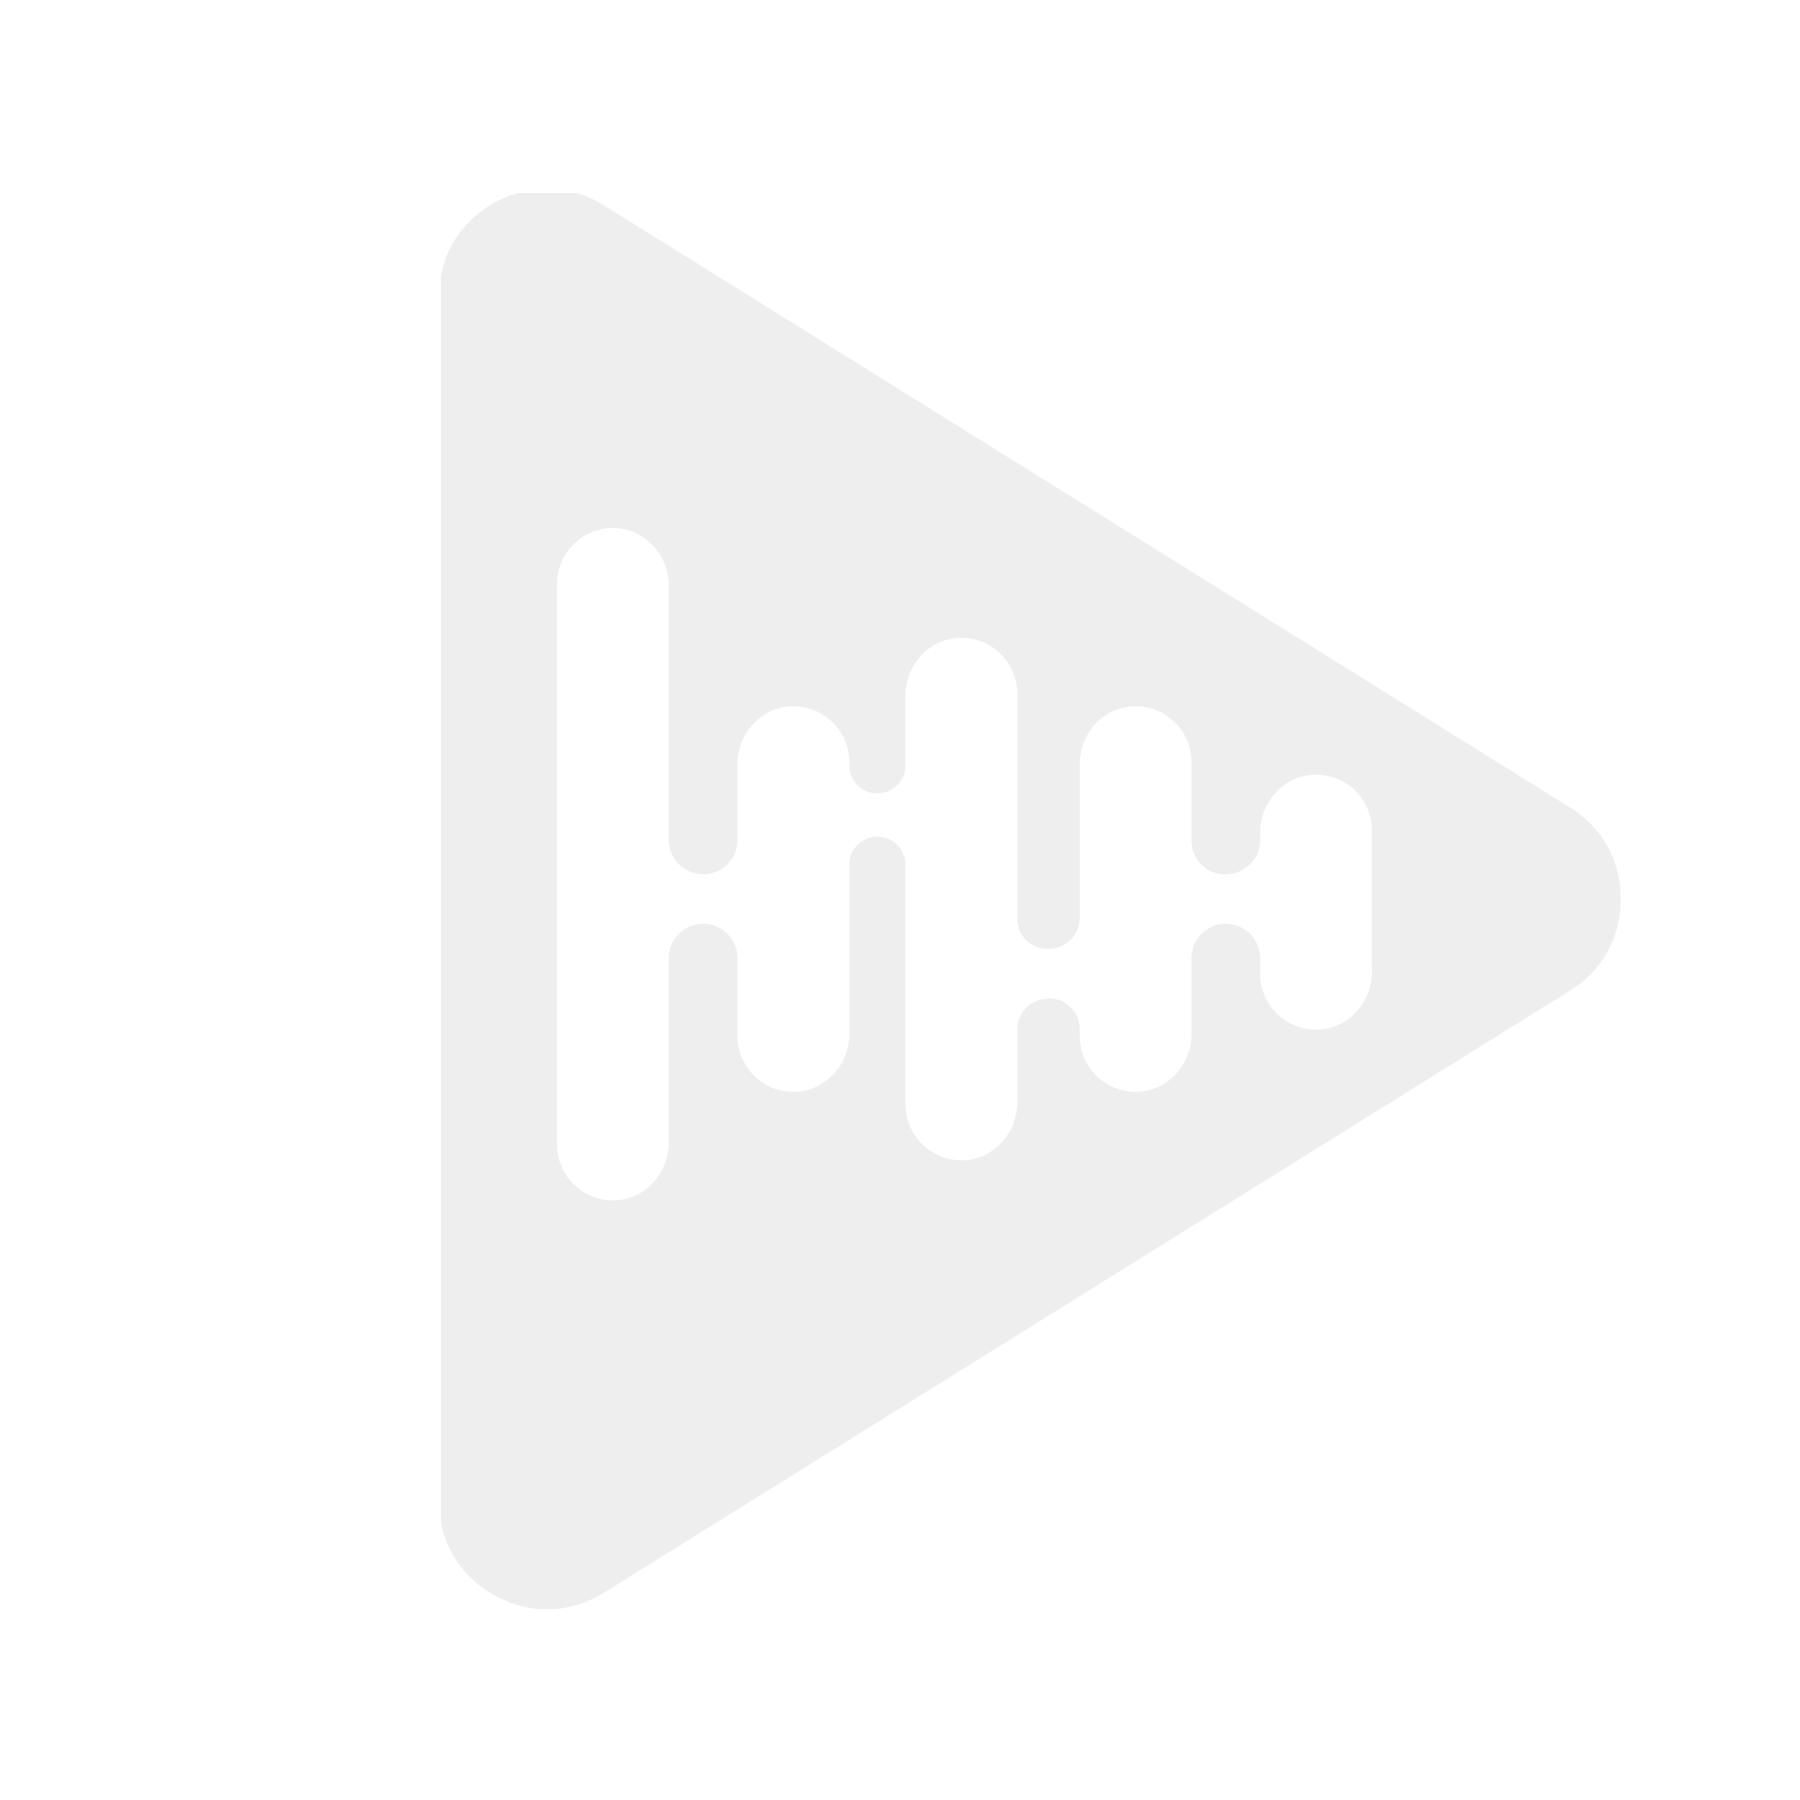 Kufatec Fiscon 36721-1 - Blåtann-integrering, Audi A5 Cabriolet ('09 >)